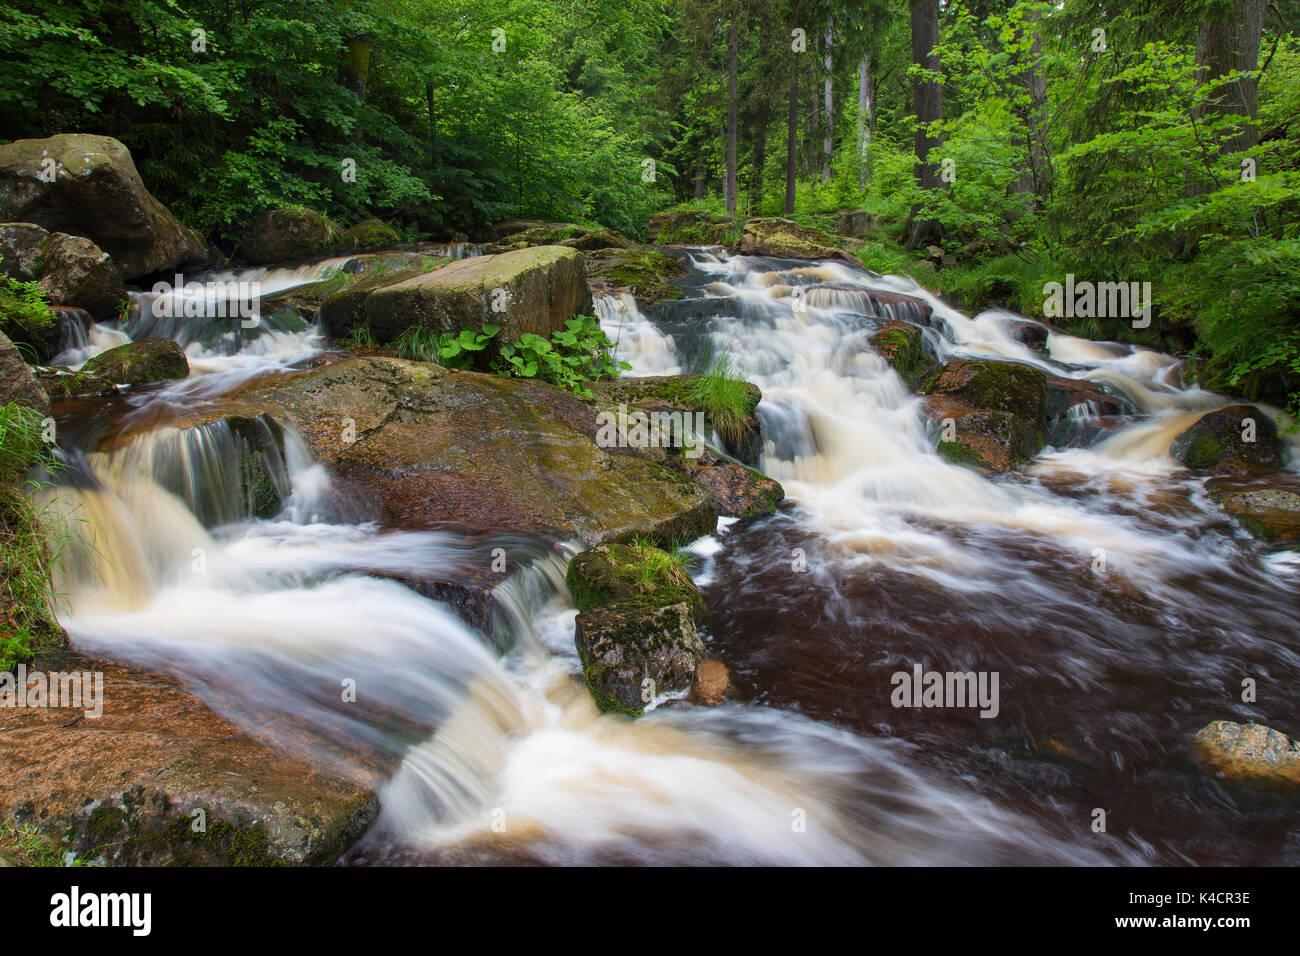 Untere Bodewasserfall / Waterfall Untere Bodefall / Lower Bodefall on the river Warme Bode near Braunlage, Harz National Park, Lower Saxony, Germany - Stock Image